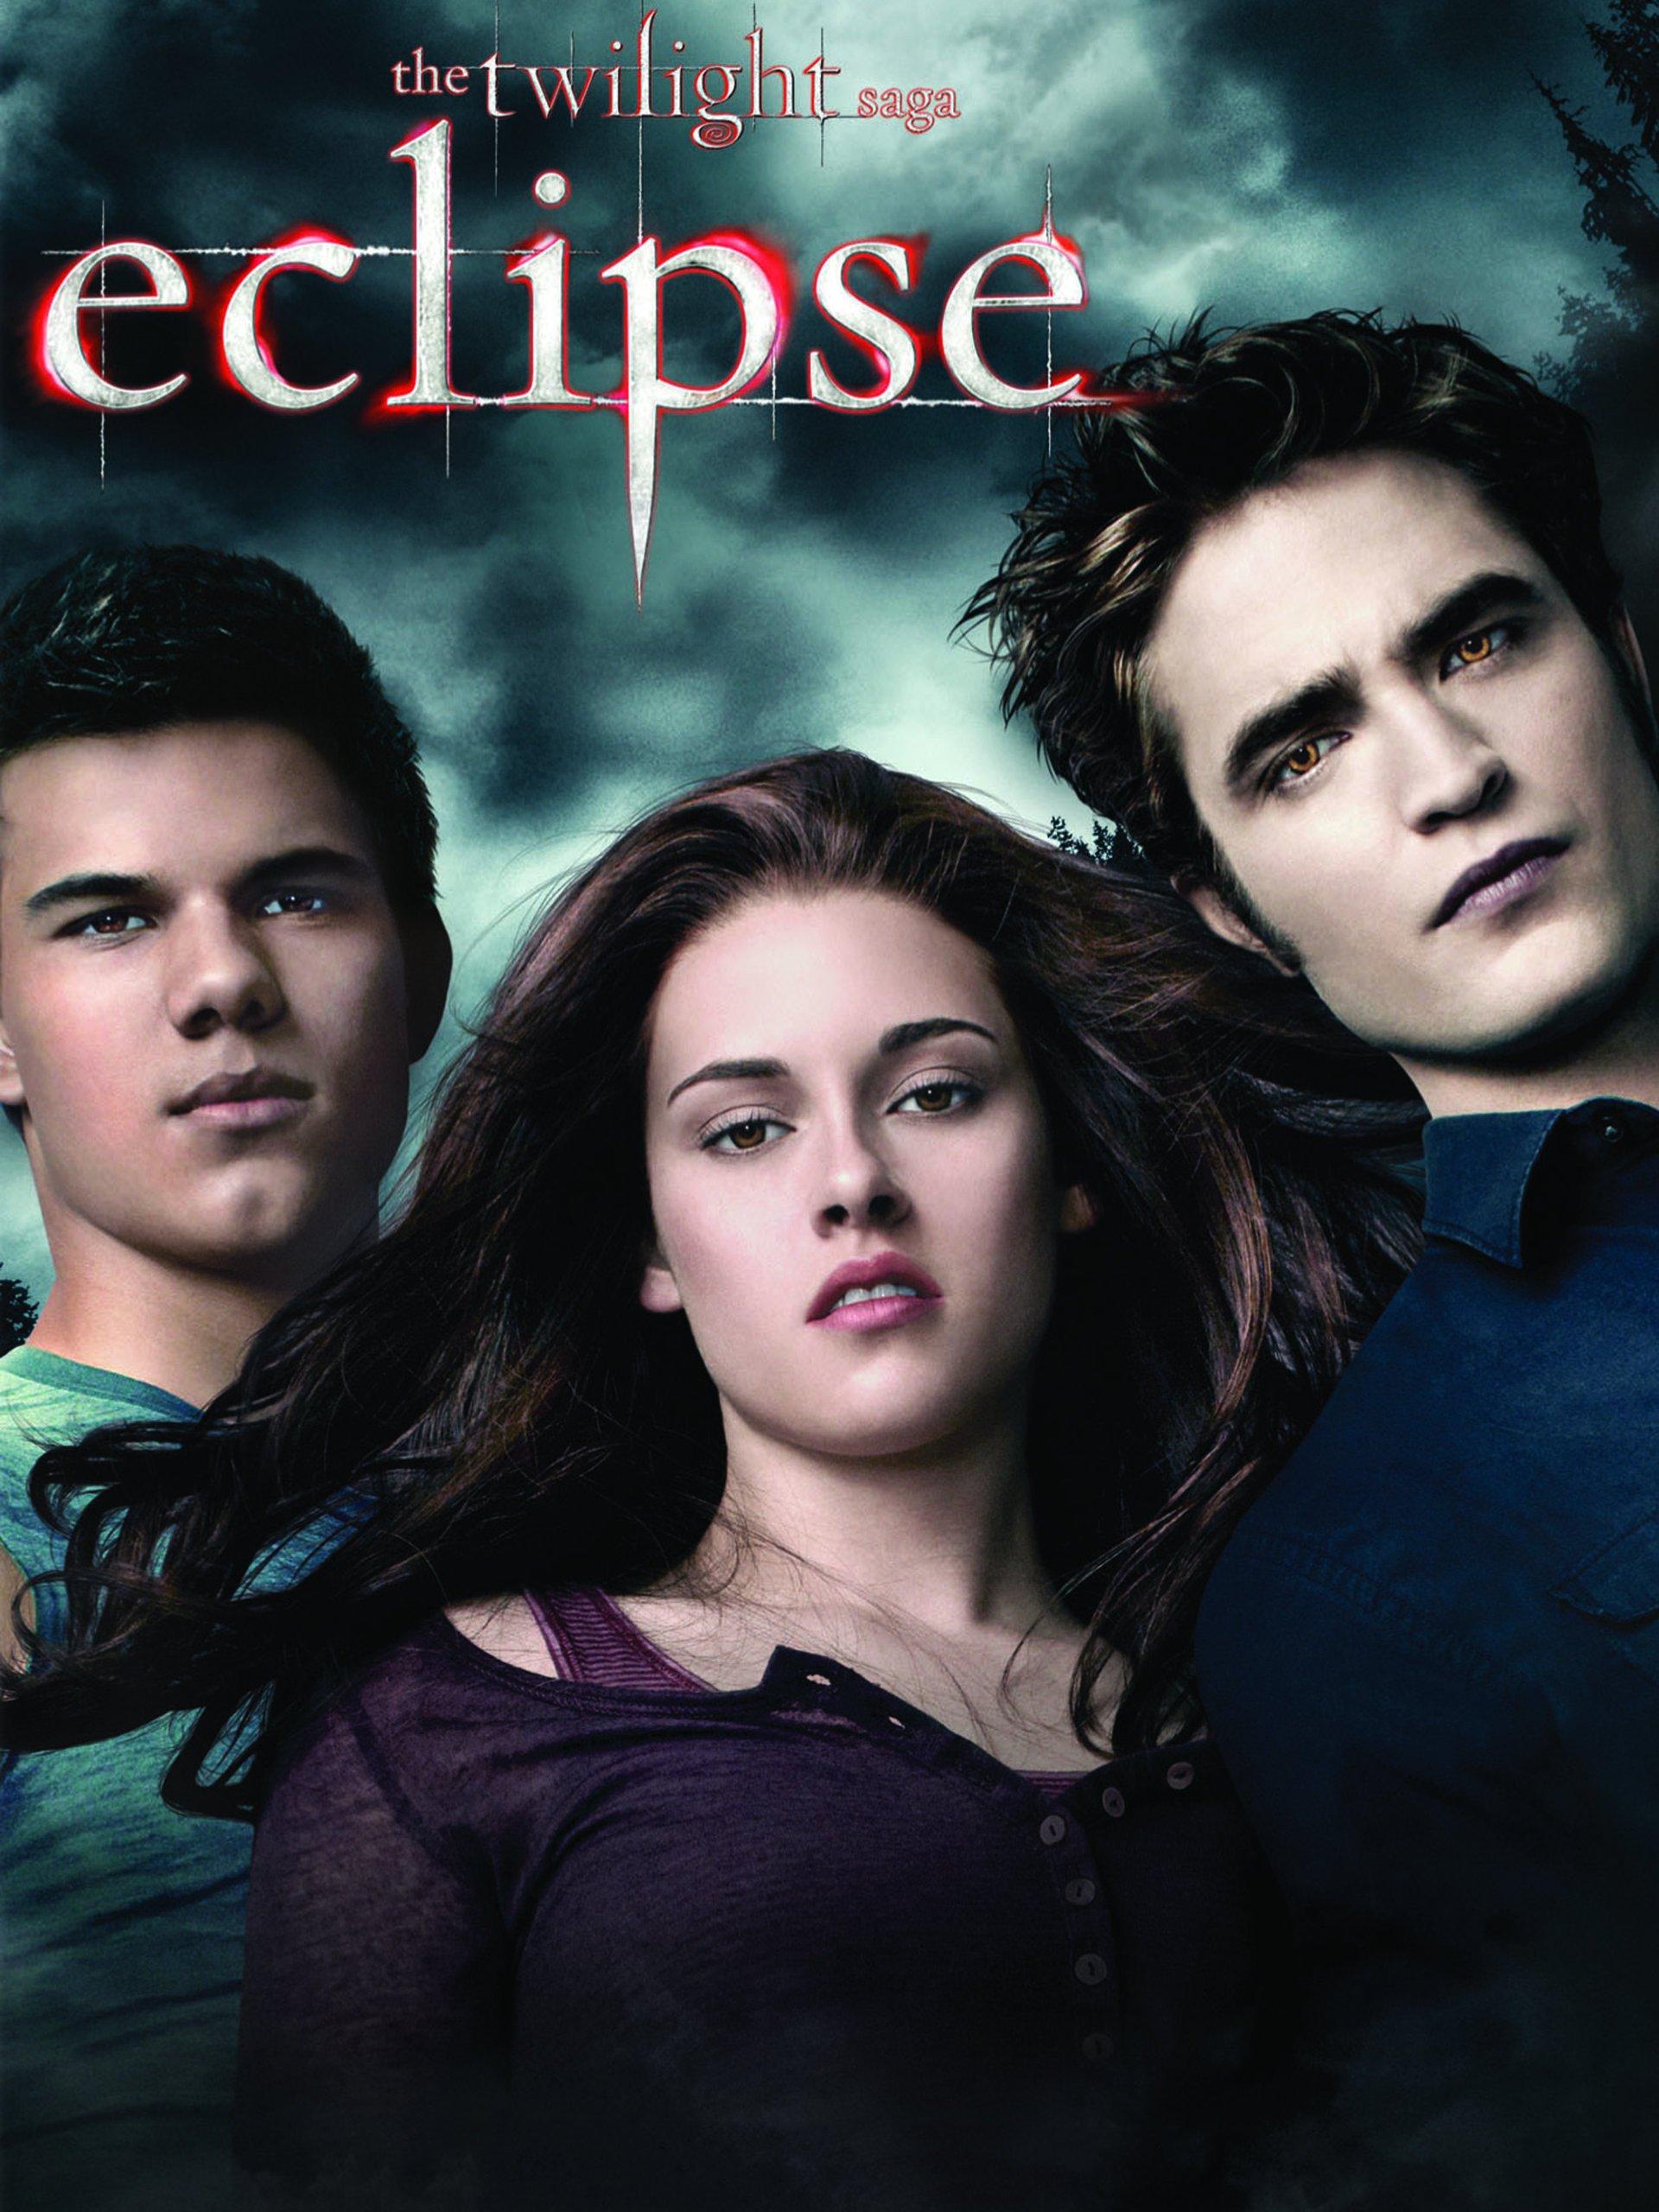 twilight eclipse full movie free download hd